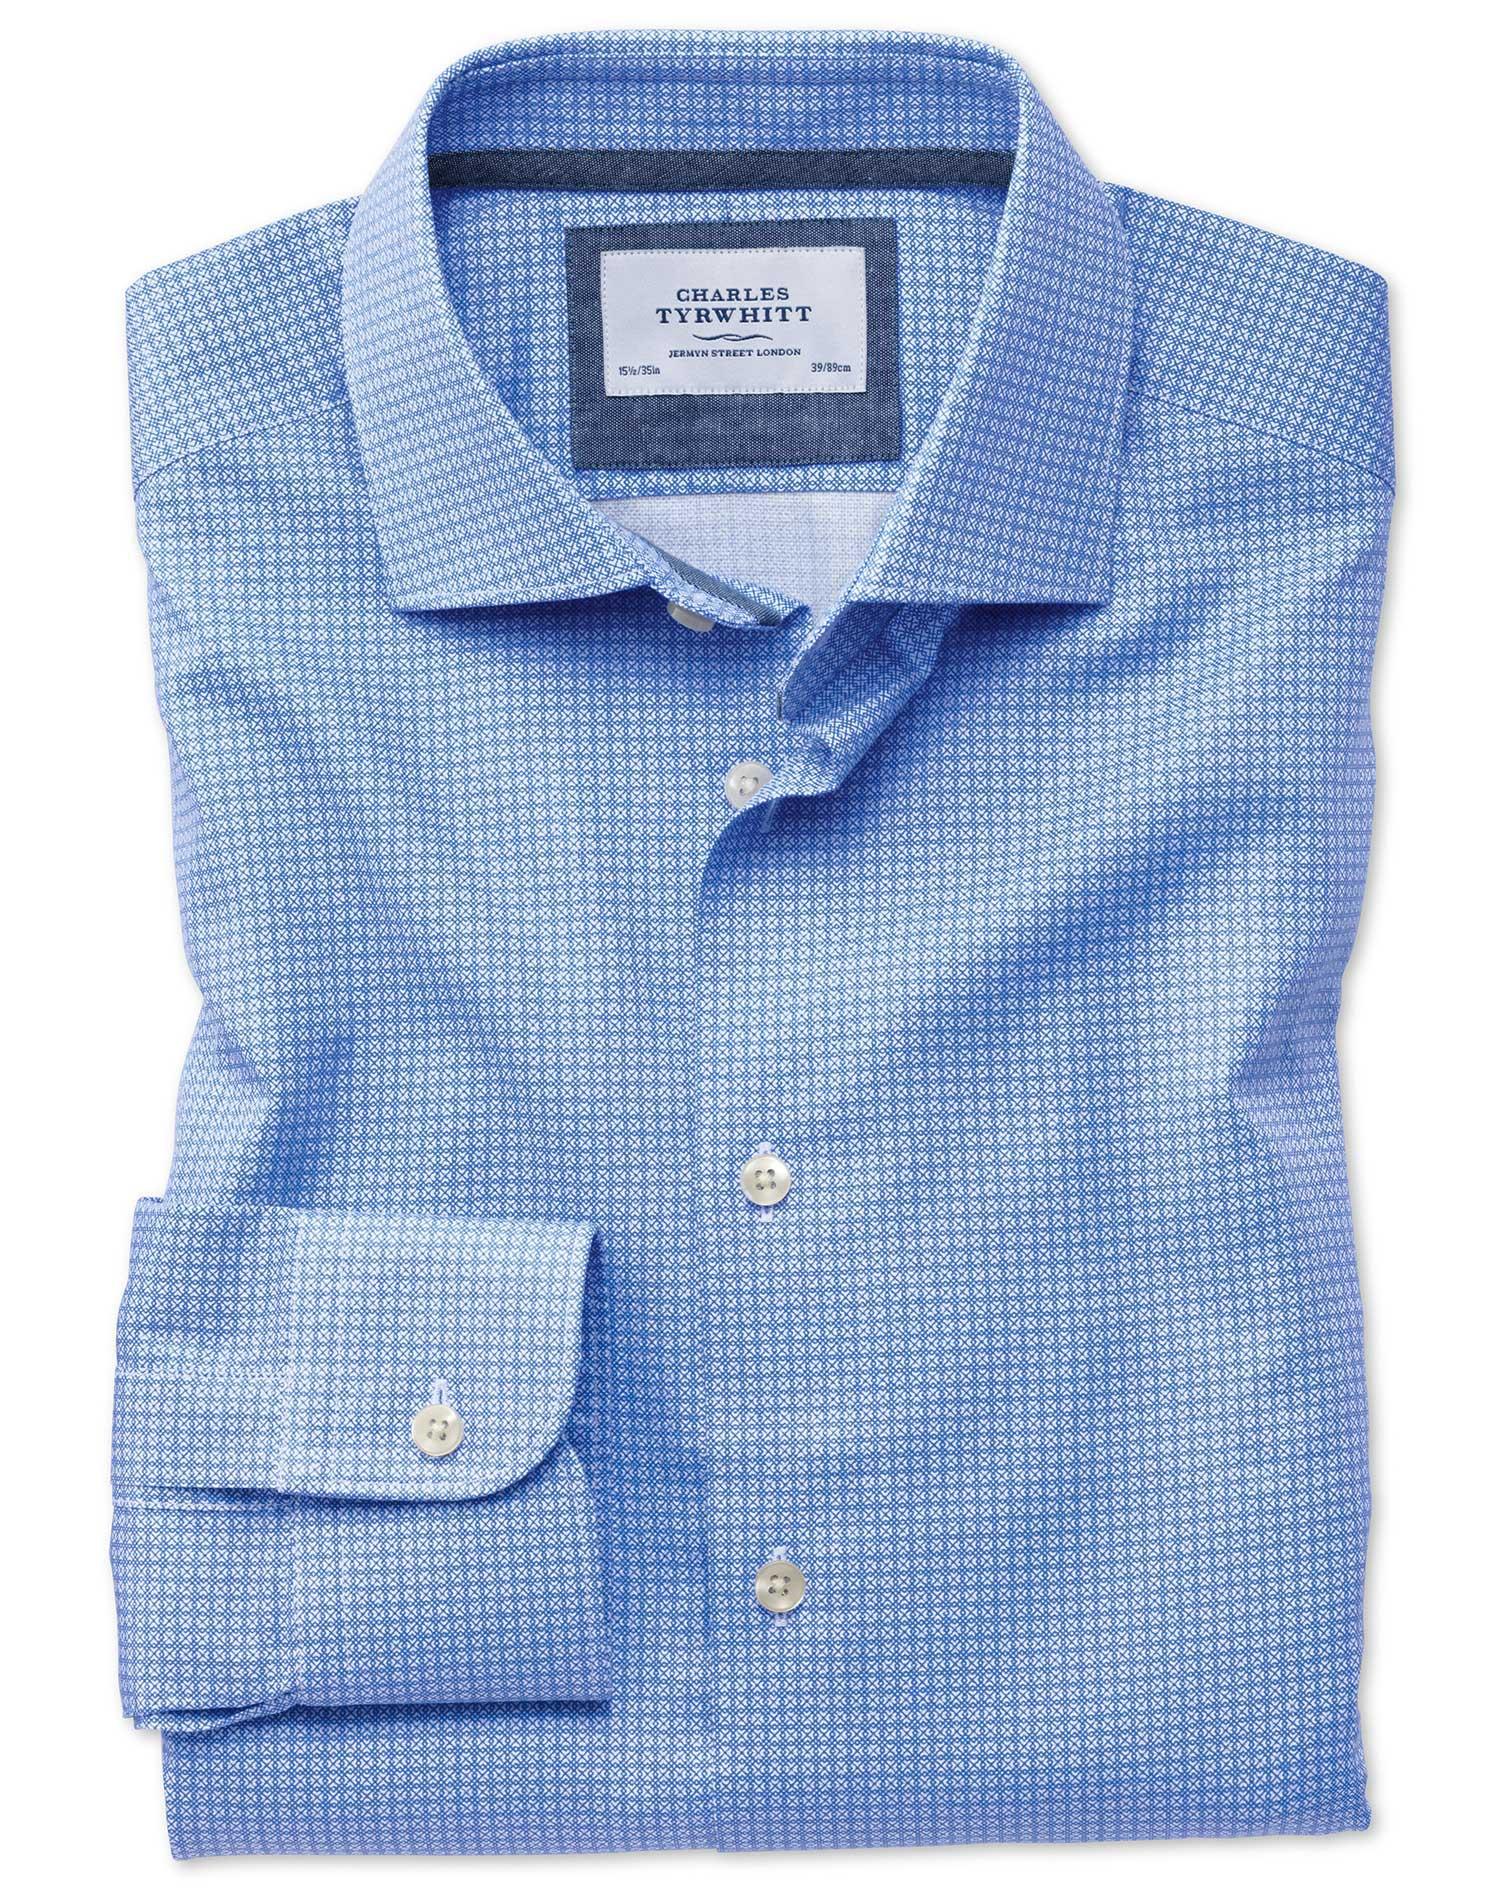 Classic Fit Semi-Cutaway Business Casual Geometric Print Mid Blue Egyptian Cotton Formal Shirt Singl